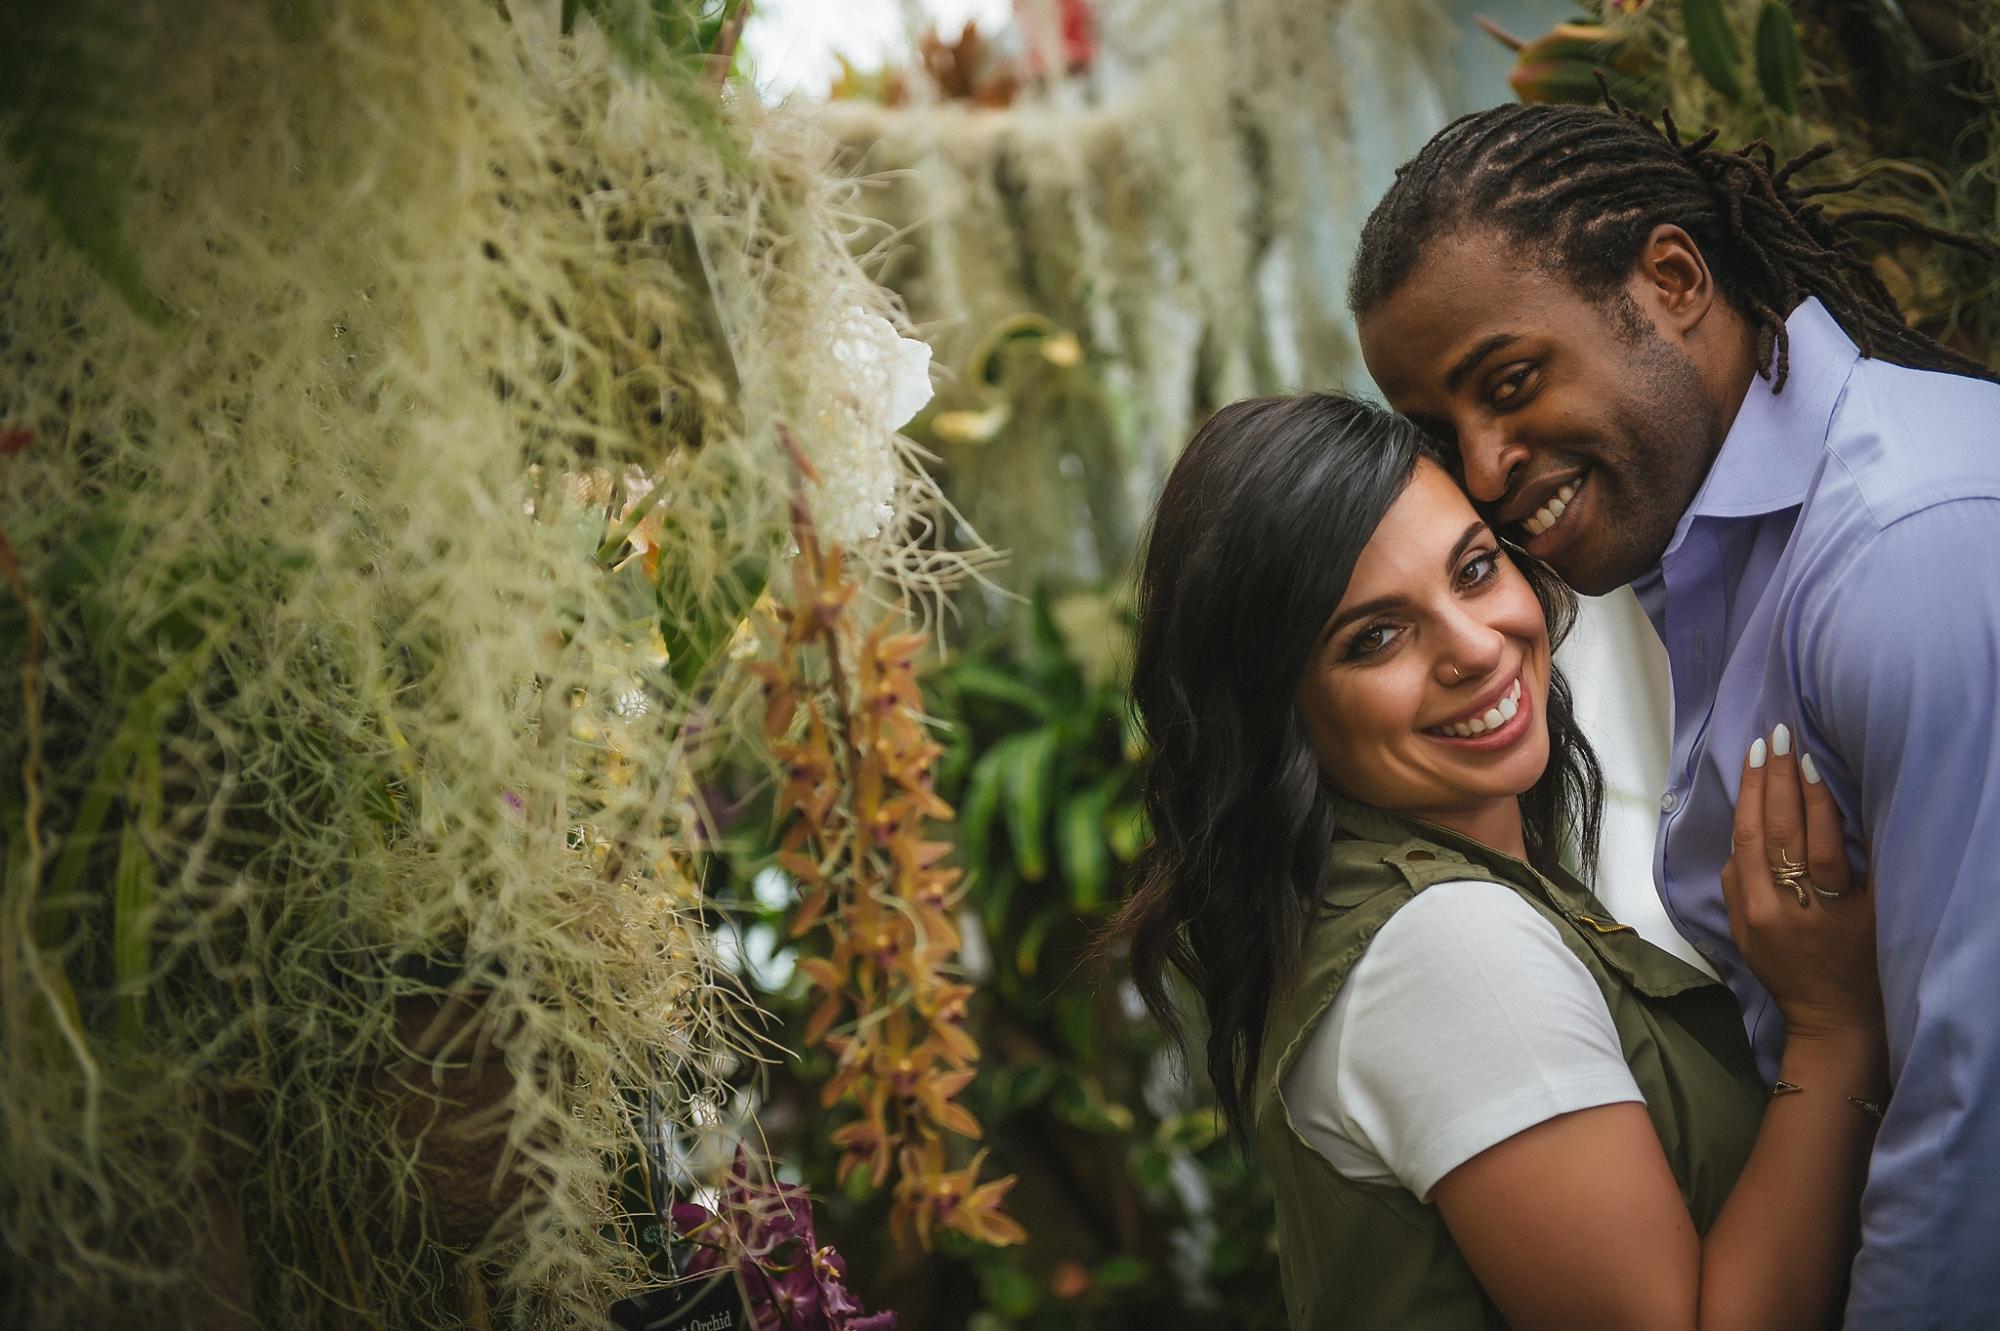 Basking-ridge-country-club-wedding-photographer-8